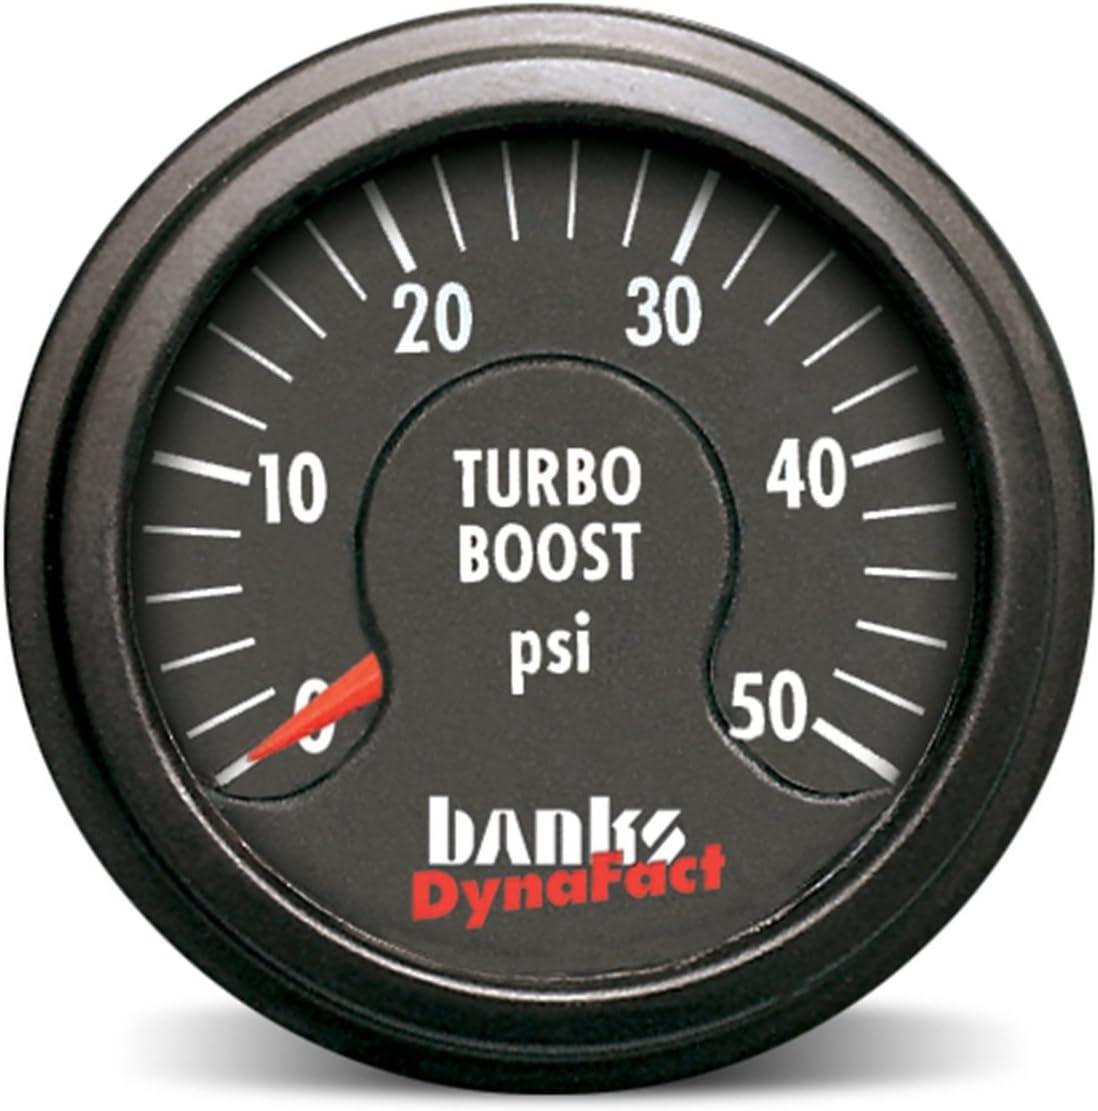 Banks 64051 Boost Gauge Kit 0-50 PSI